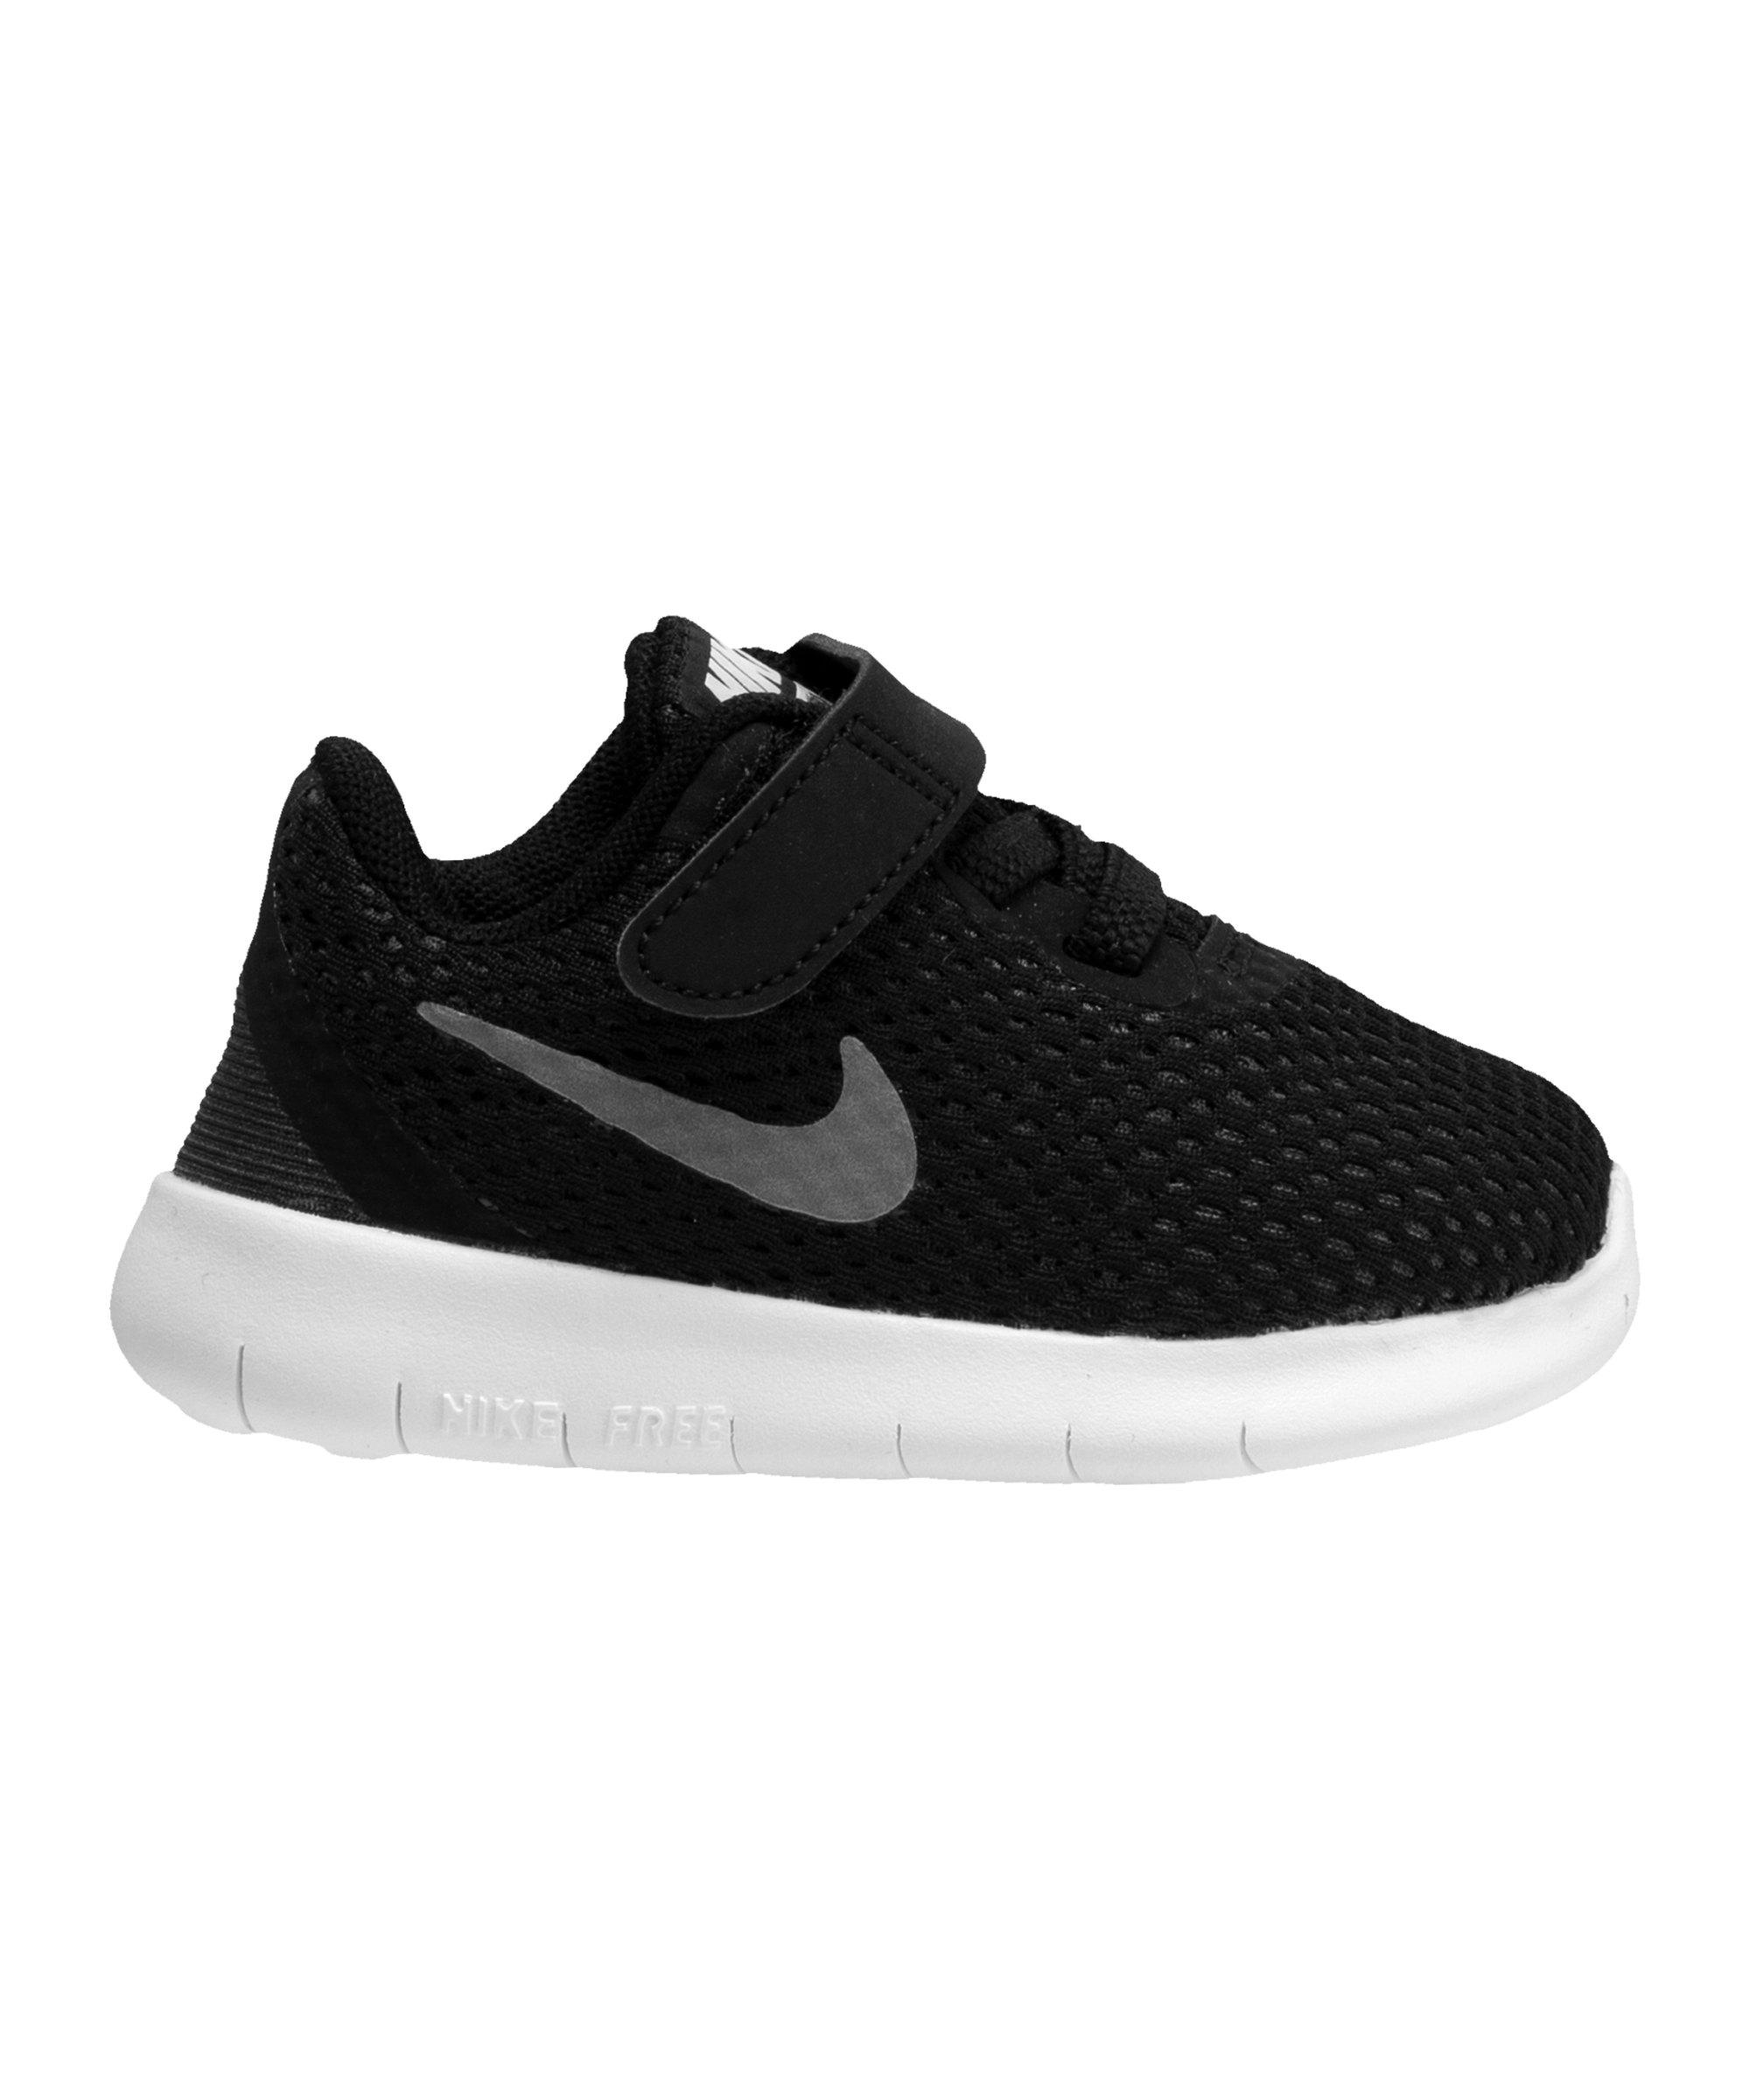 Nike Free RN F001 - Schwarz